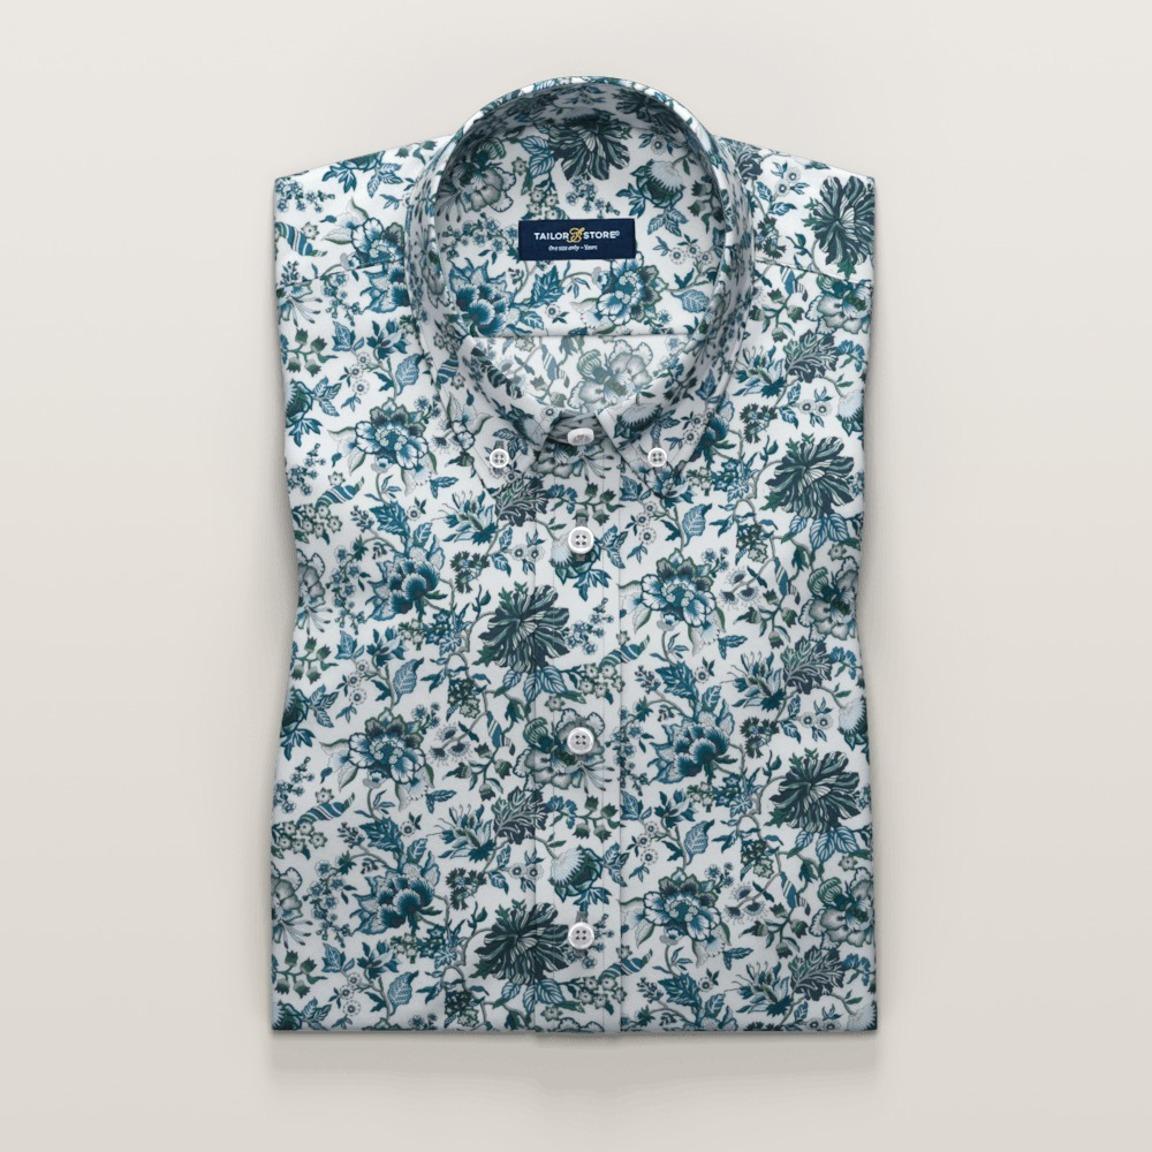 Dark blue printed short sleeved shirt